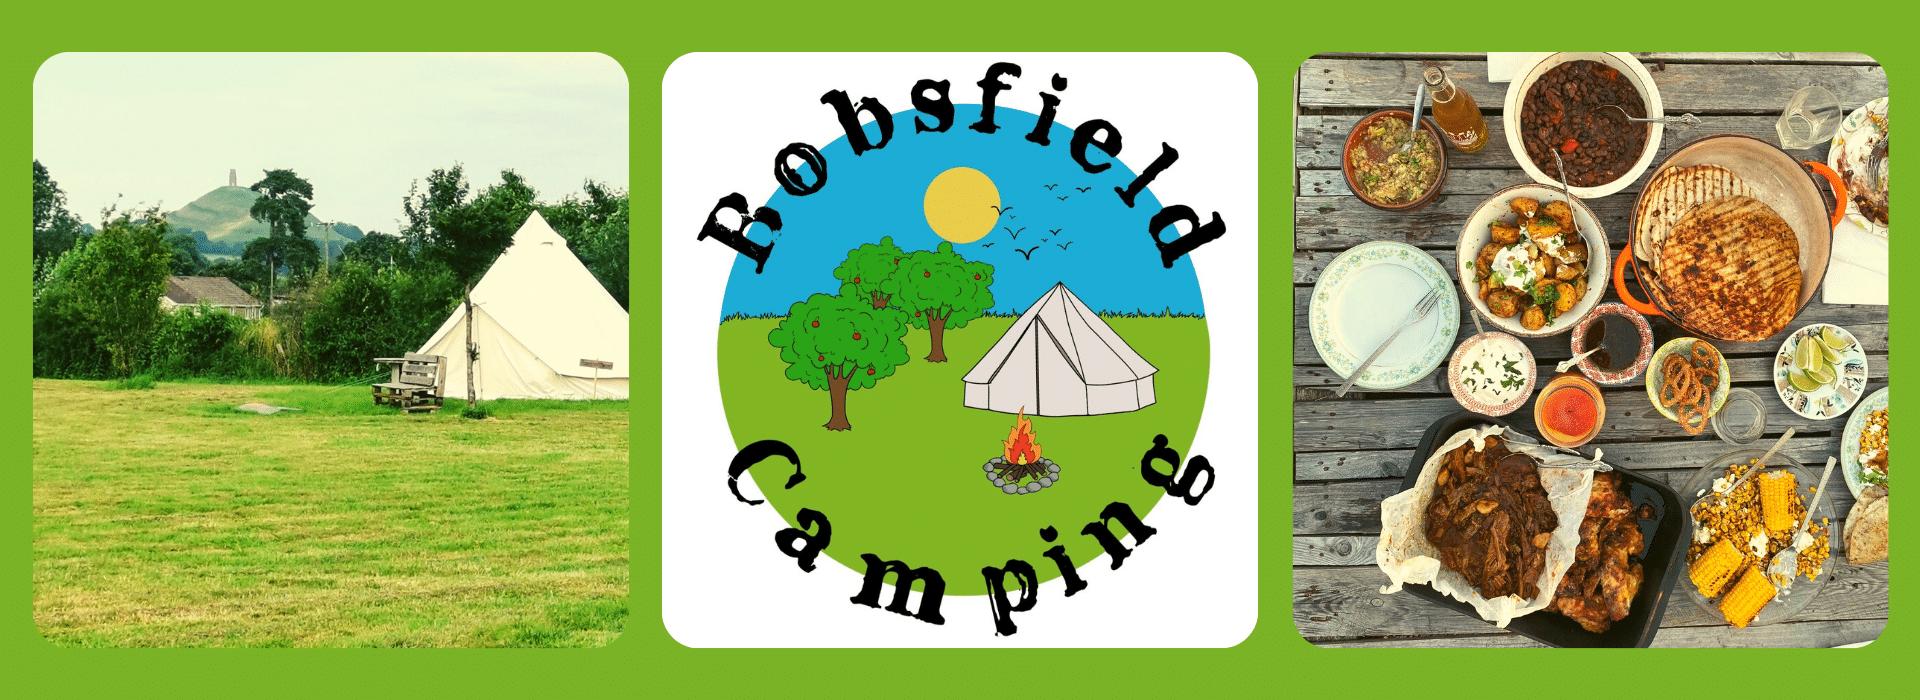 Bob's Field Banner